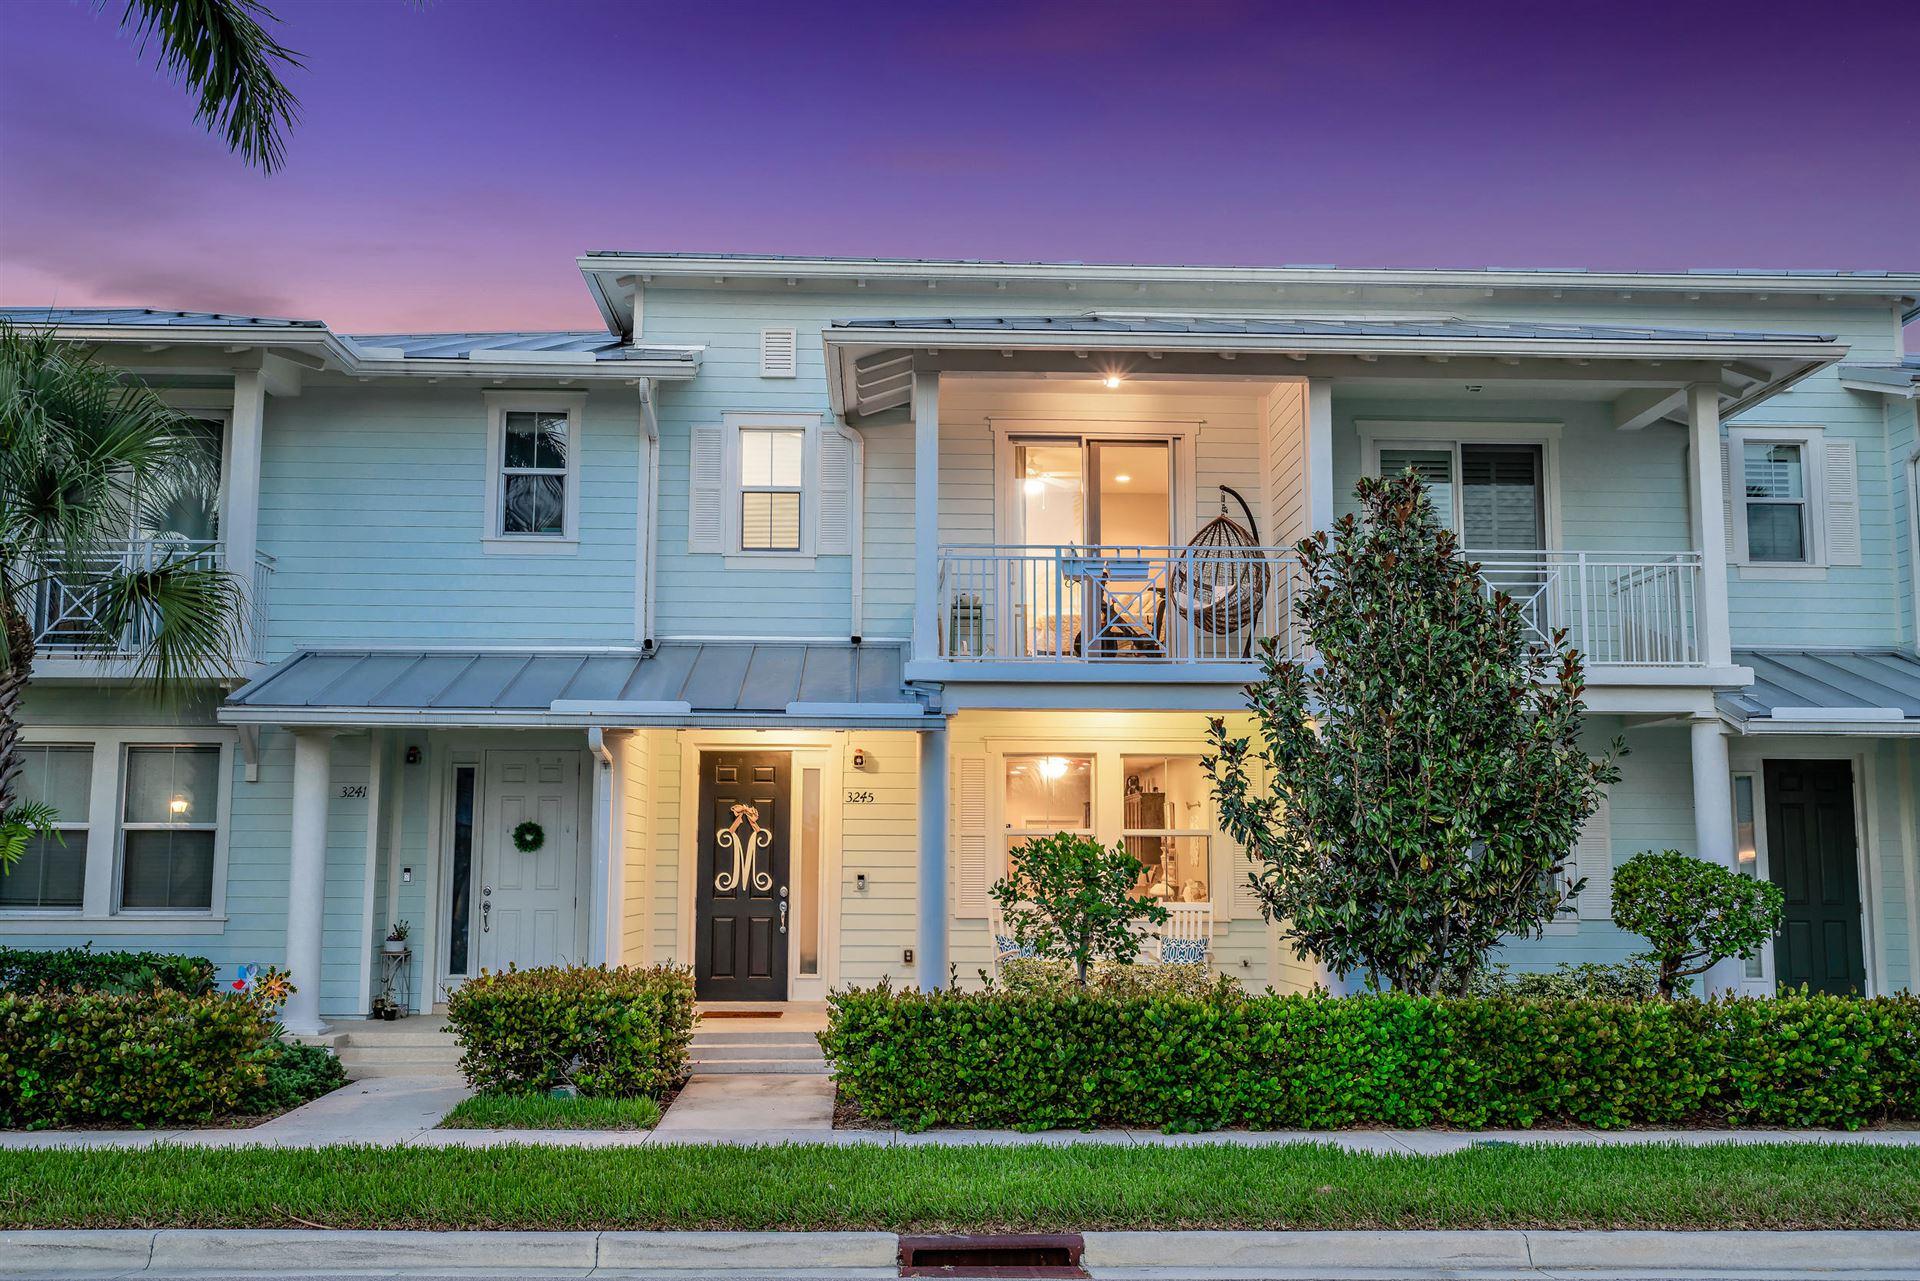 Photo of 3245 Hemingway Drive, Jupiter, FL 33458 (MLS # RX-10635848)